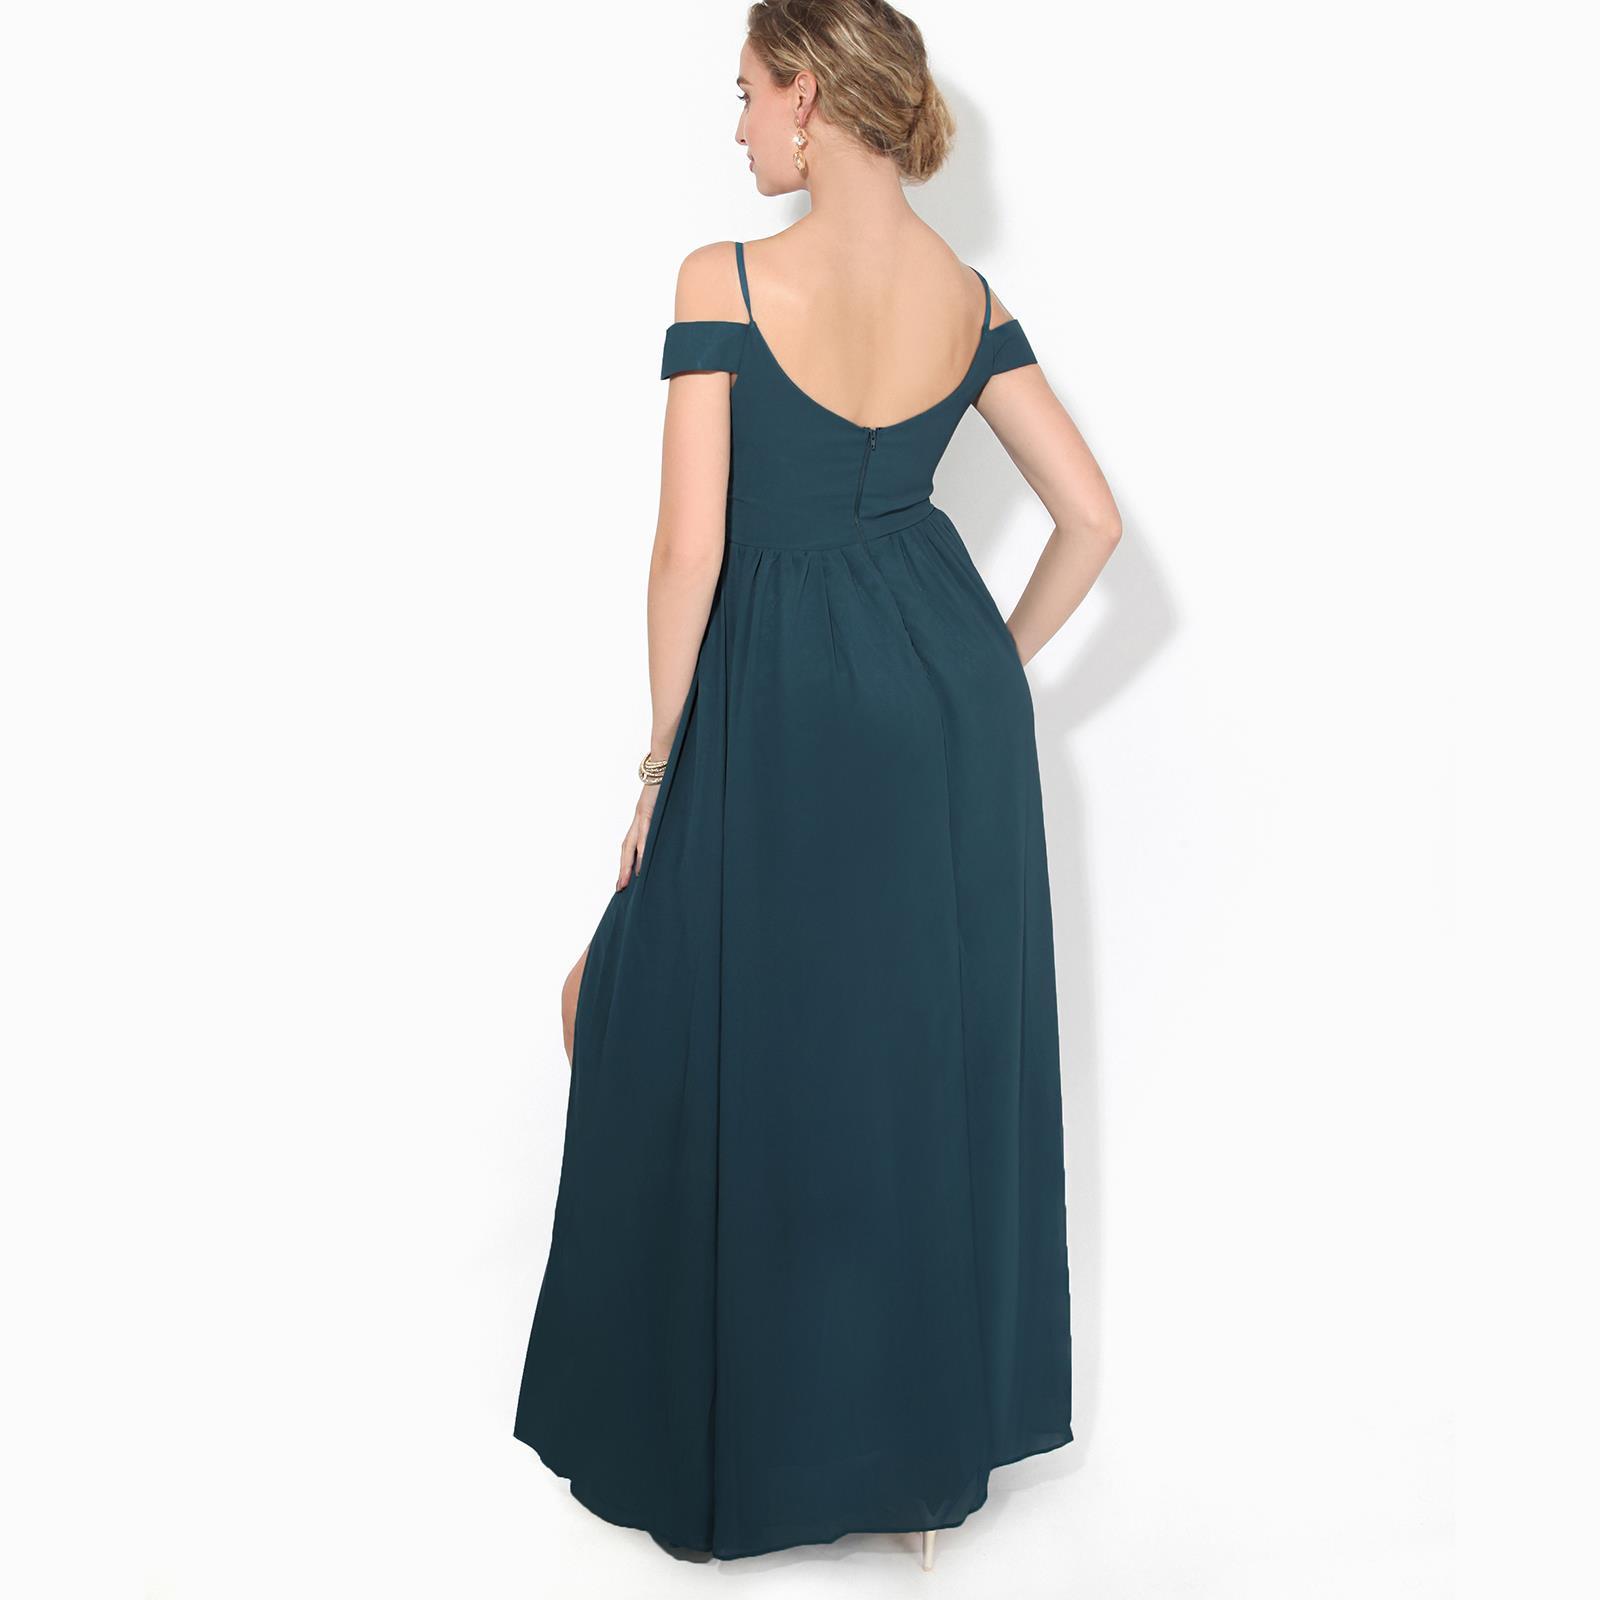 Womens-Ladies-Off-Shoulder-Formal-Maxi-Dress-Slit-Split-Long-Gown-Wedding-Party thumbnail 13